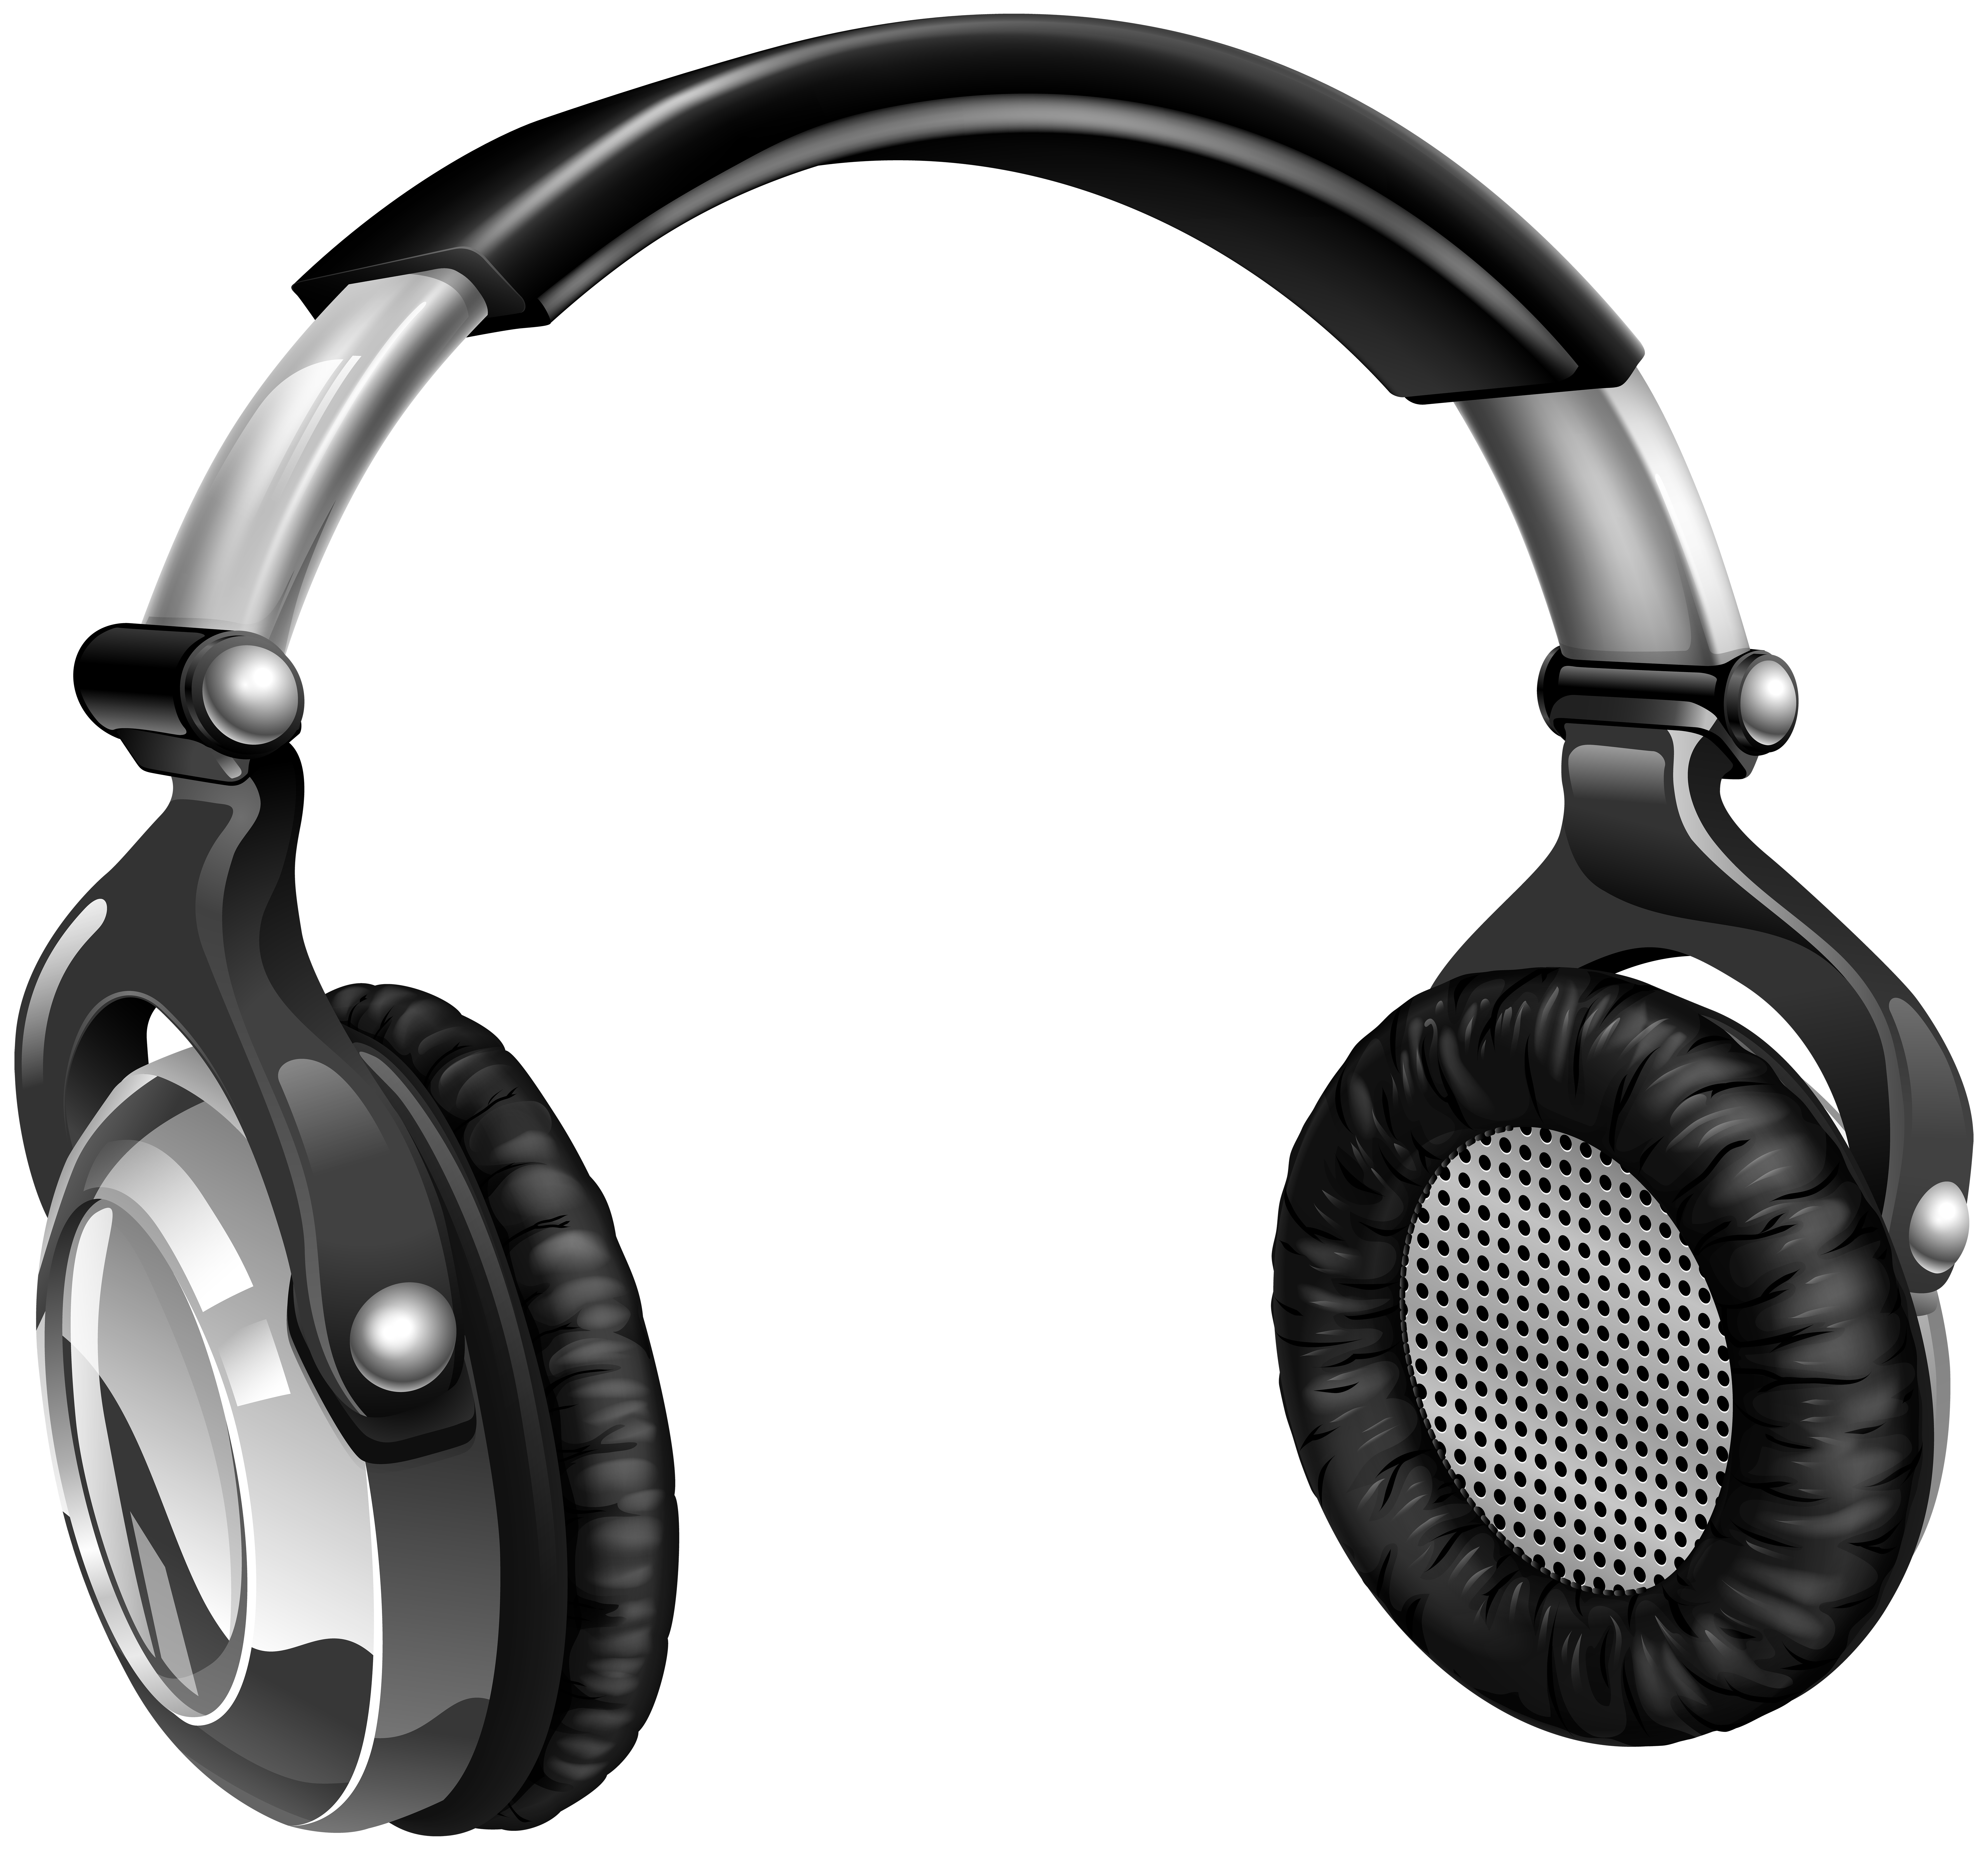 Music headset transparent image. Headphones clipart sound